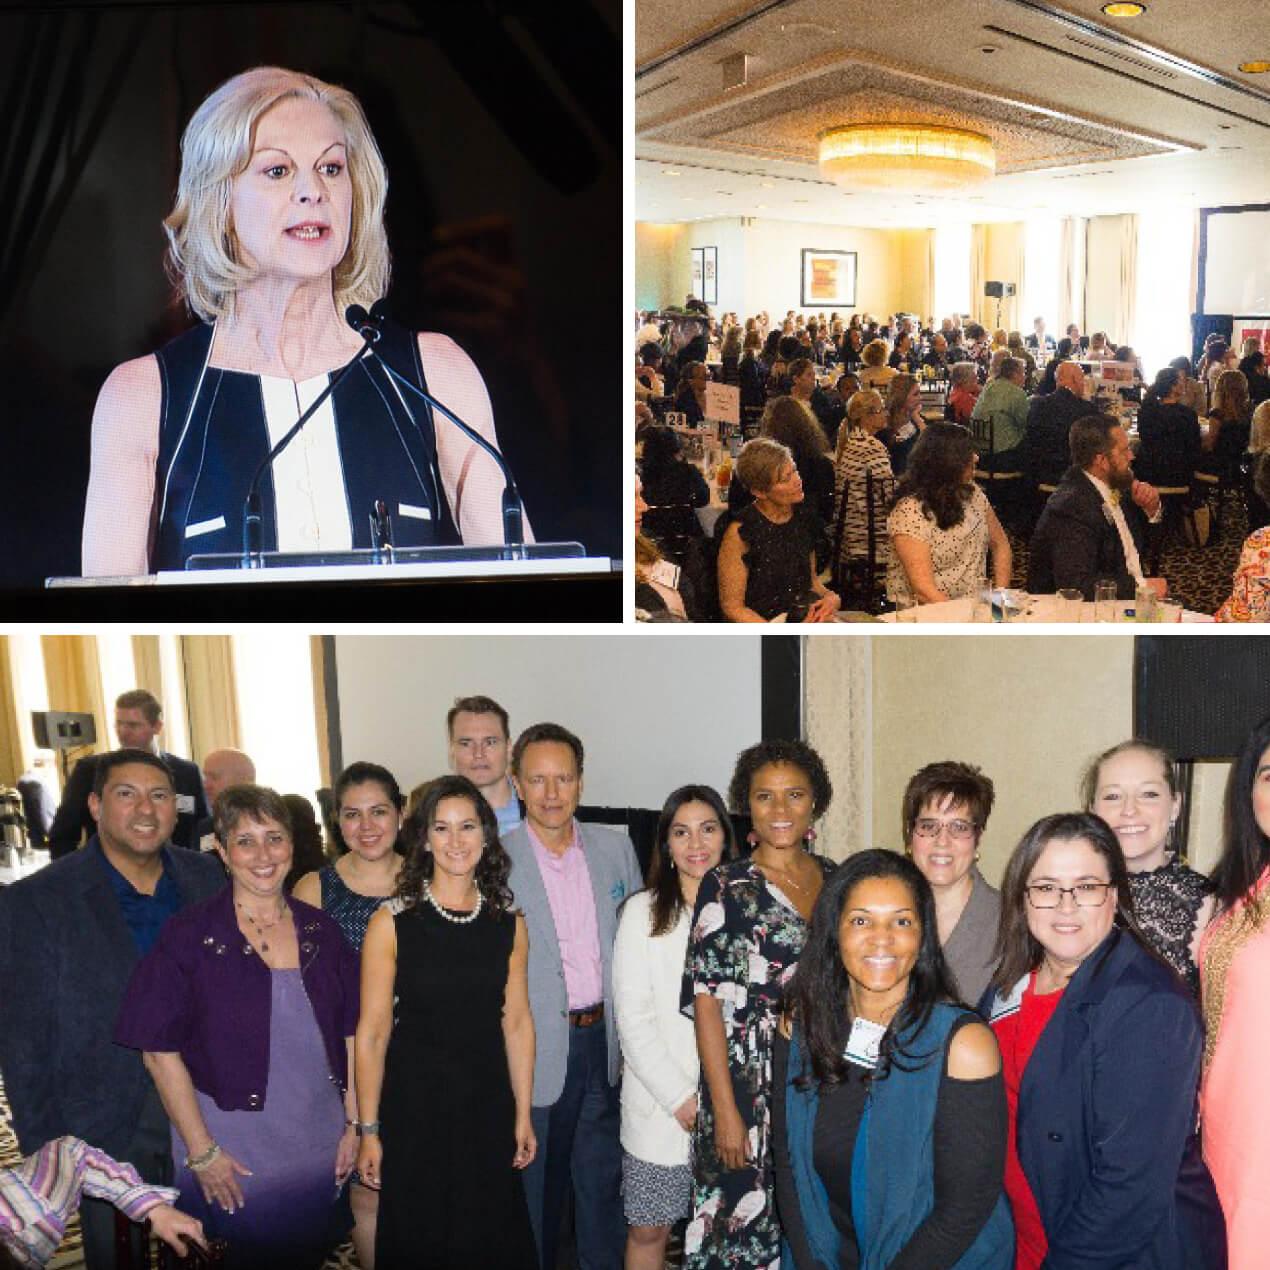 Christie Hefner Addresses Packed House at NAWBO Chicago Achievement Luncheon